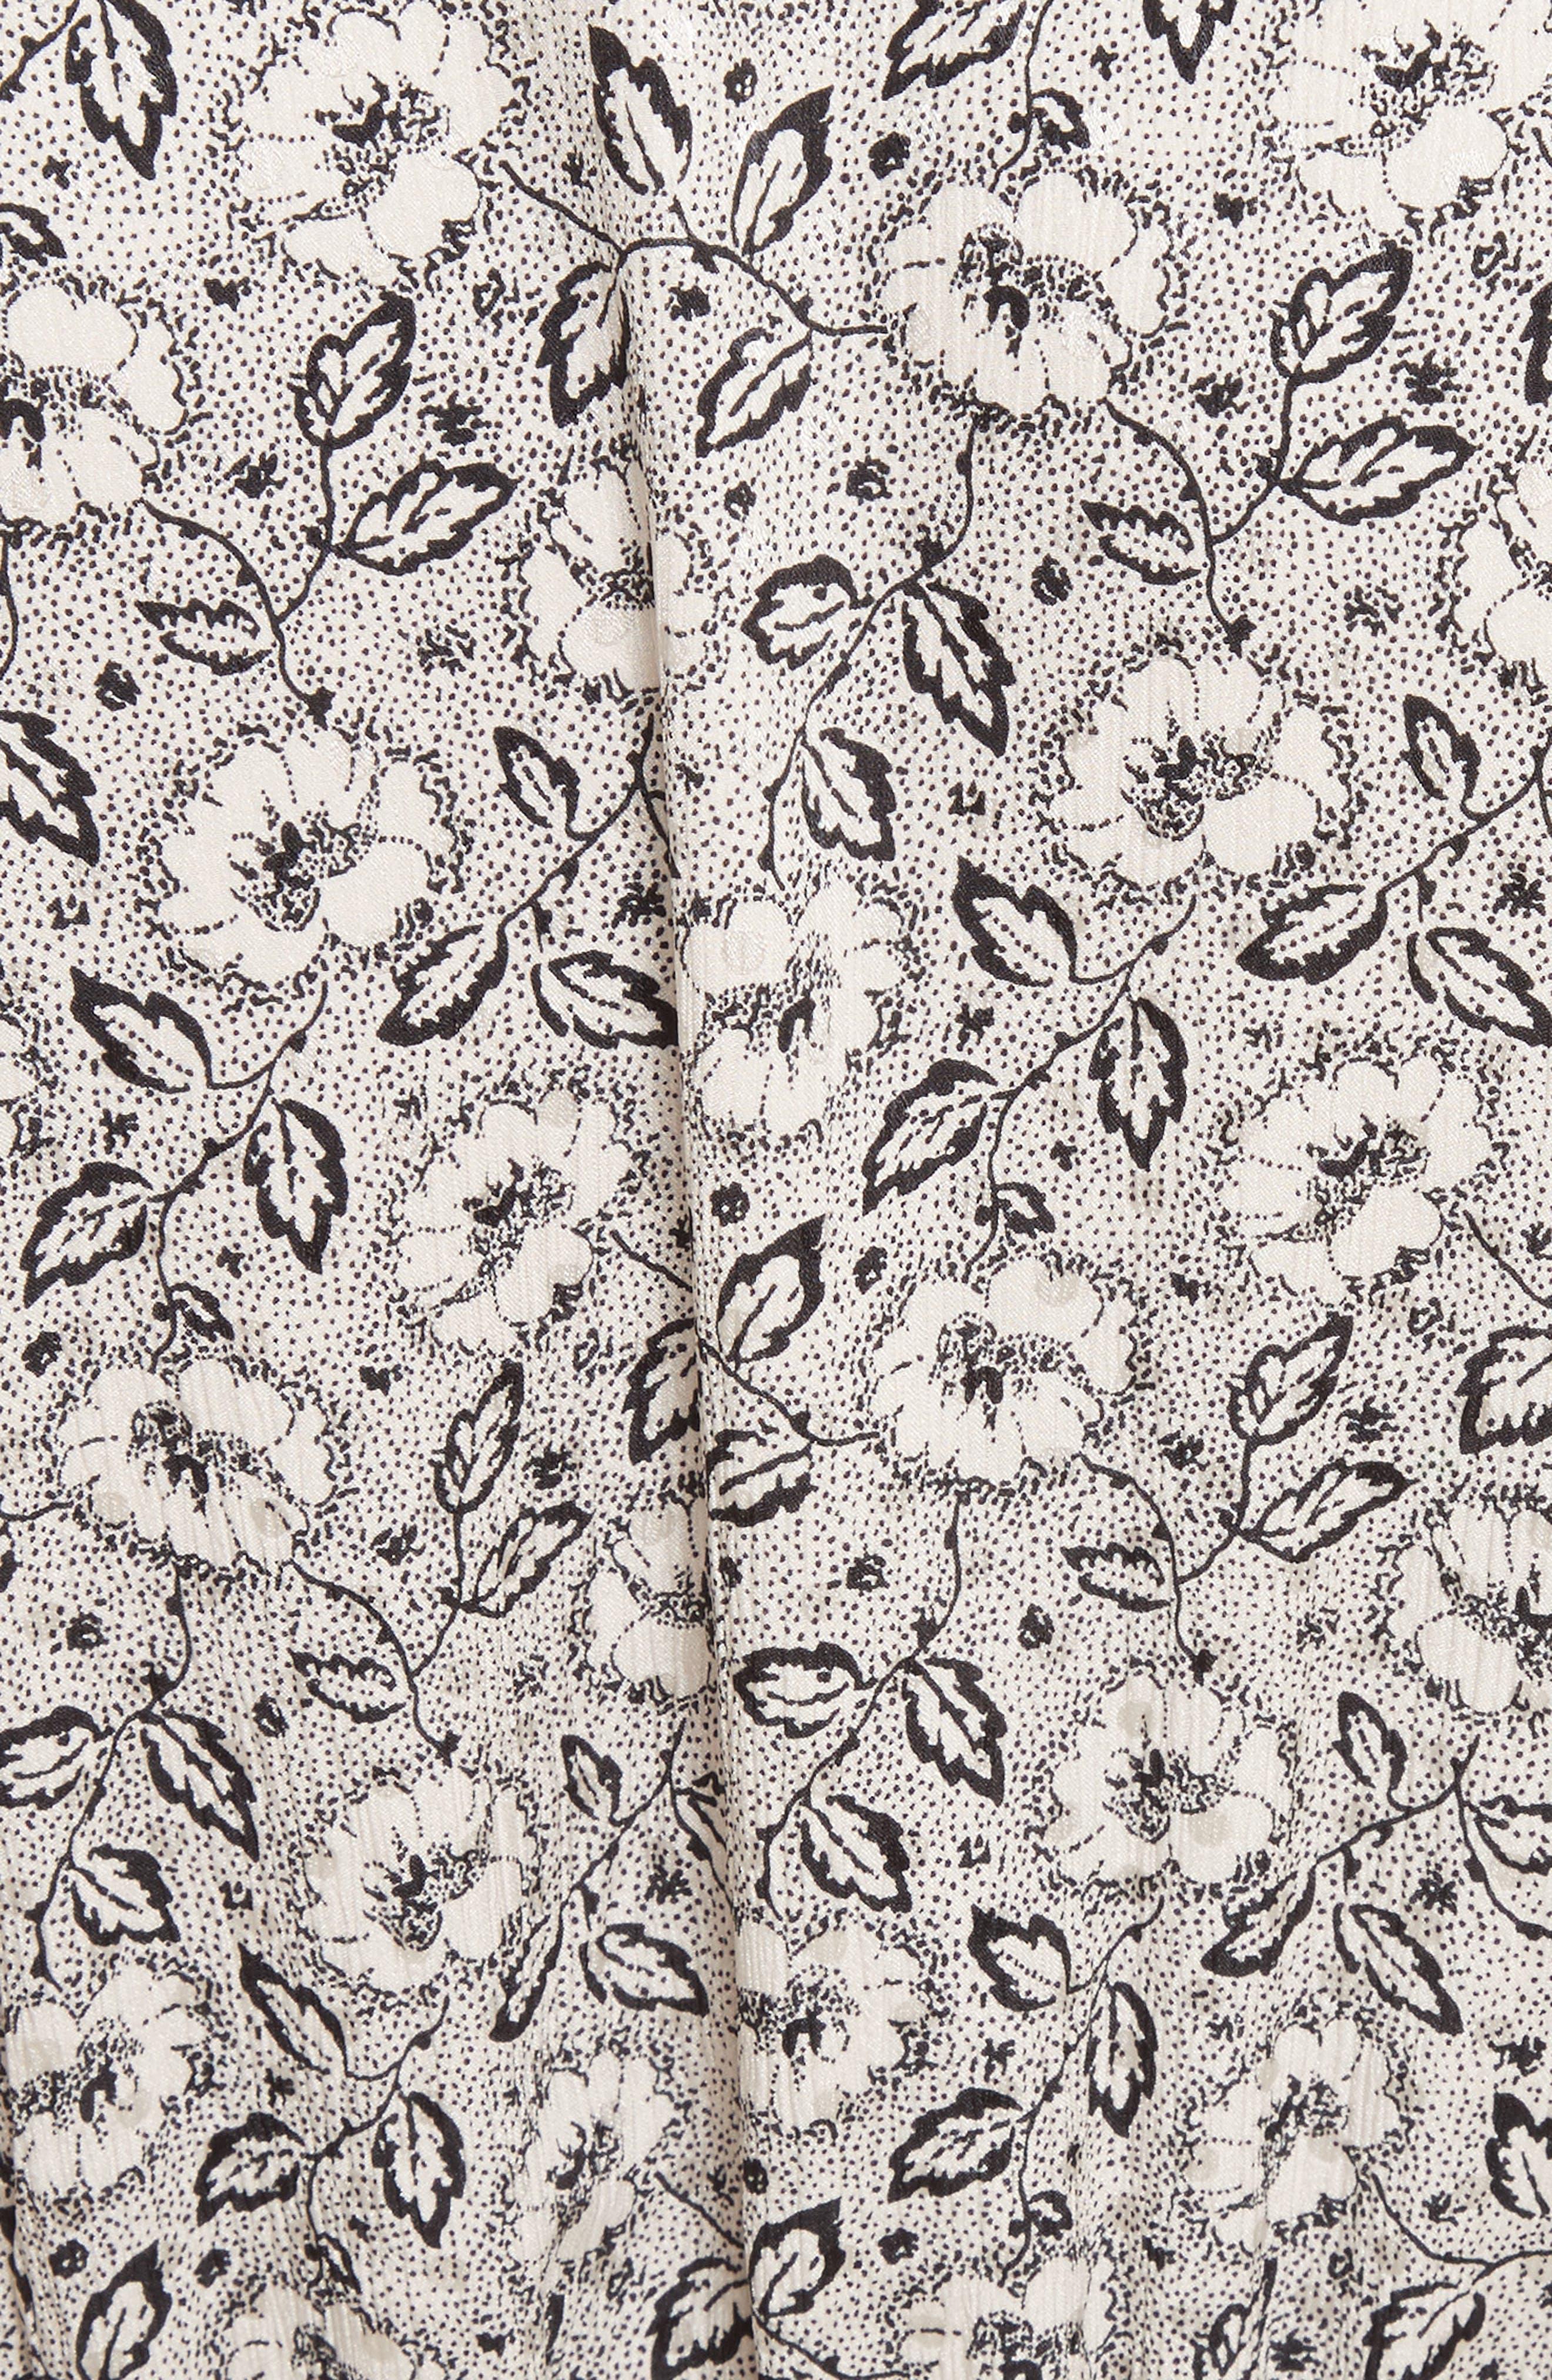 Floral A-Line Silk Dress,                             Alternate thumbnail 5, color,                             Cream Combo